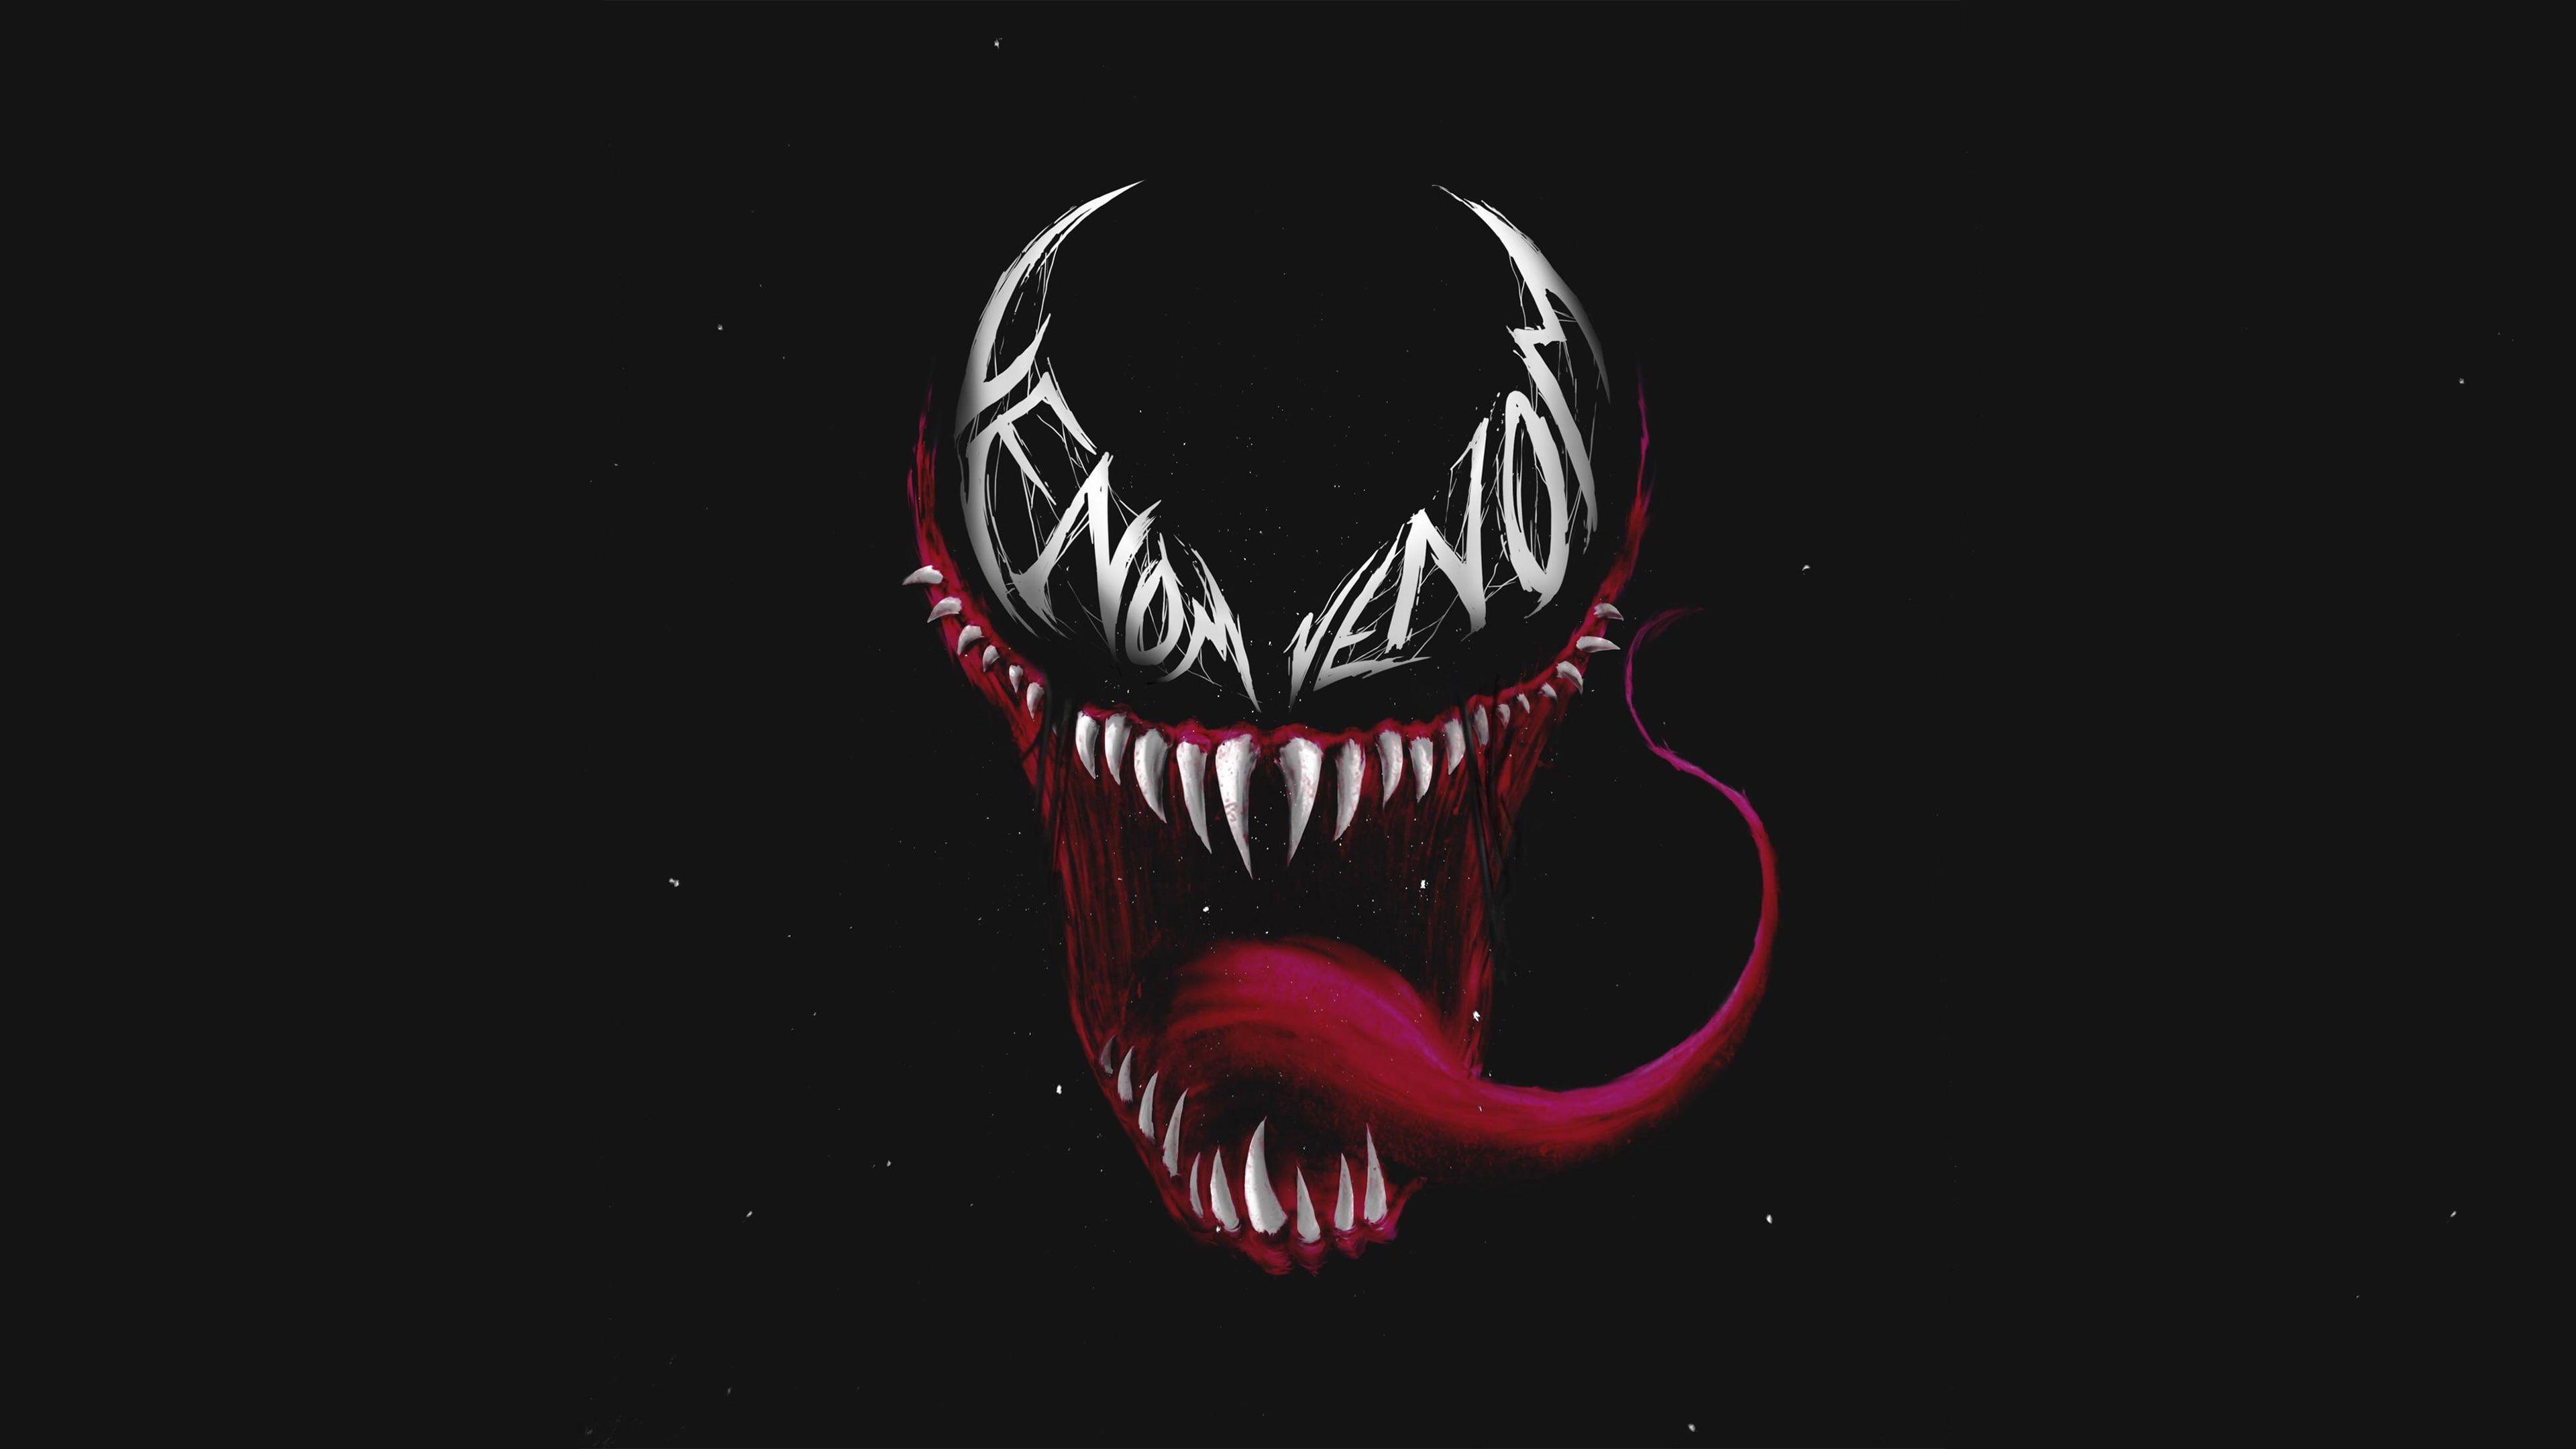 Venom Reddit Artwork Hd Artist Digital Art 4k Wallpaper Hdwallpaper Desktop In 2020 Art Wallpaper Creative Graphics Spiderman Artwork